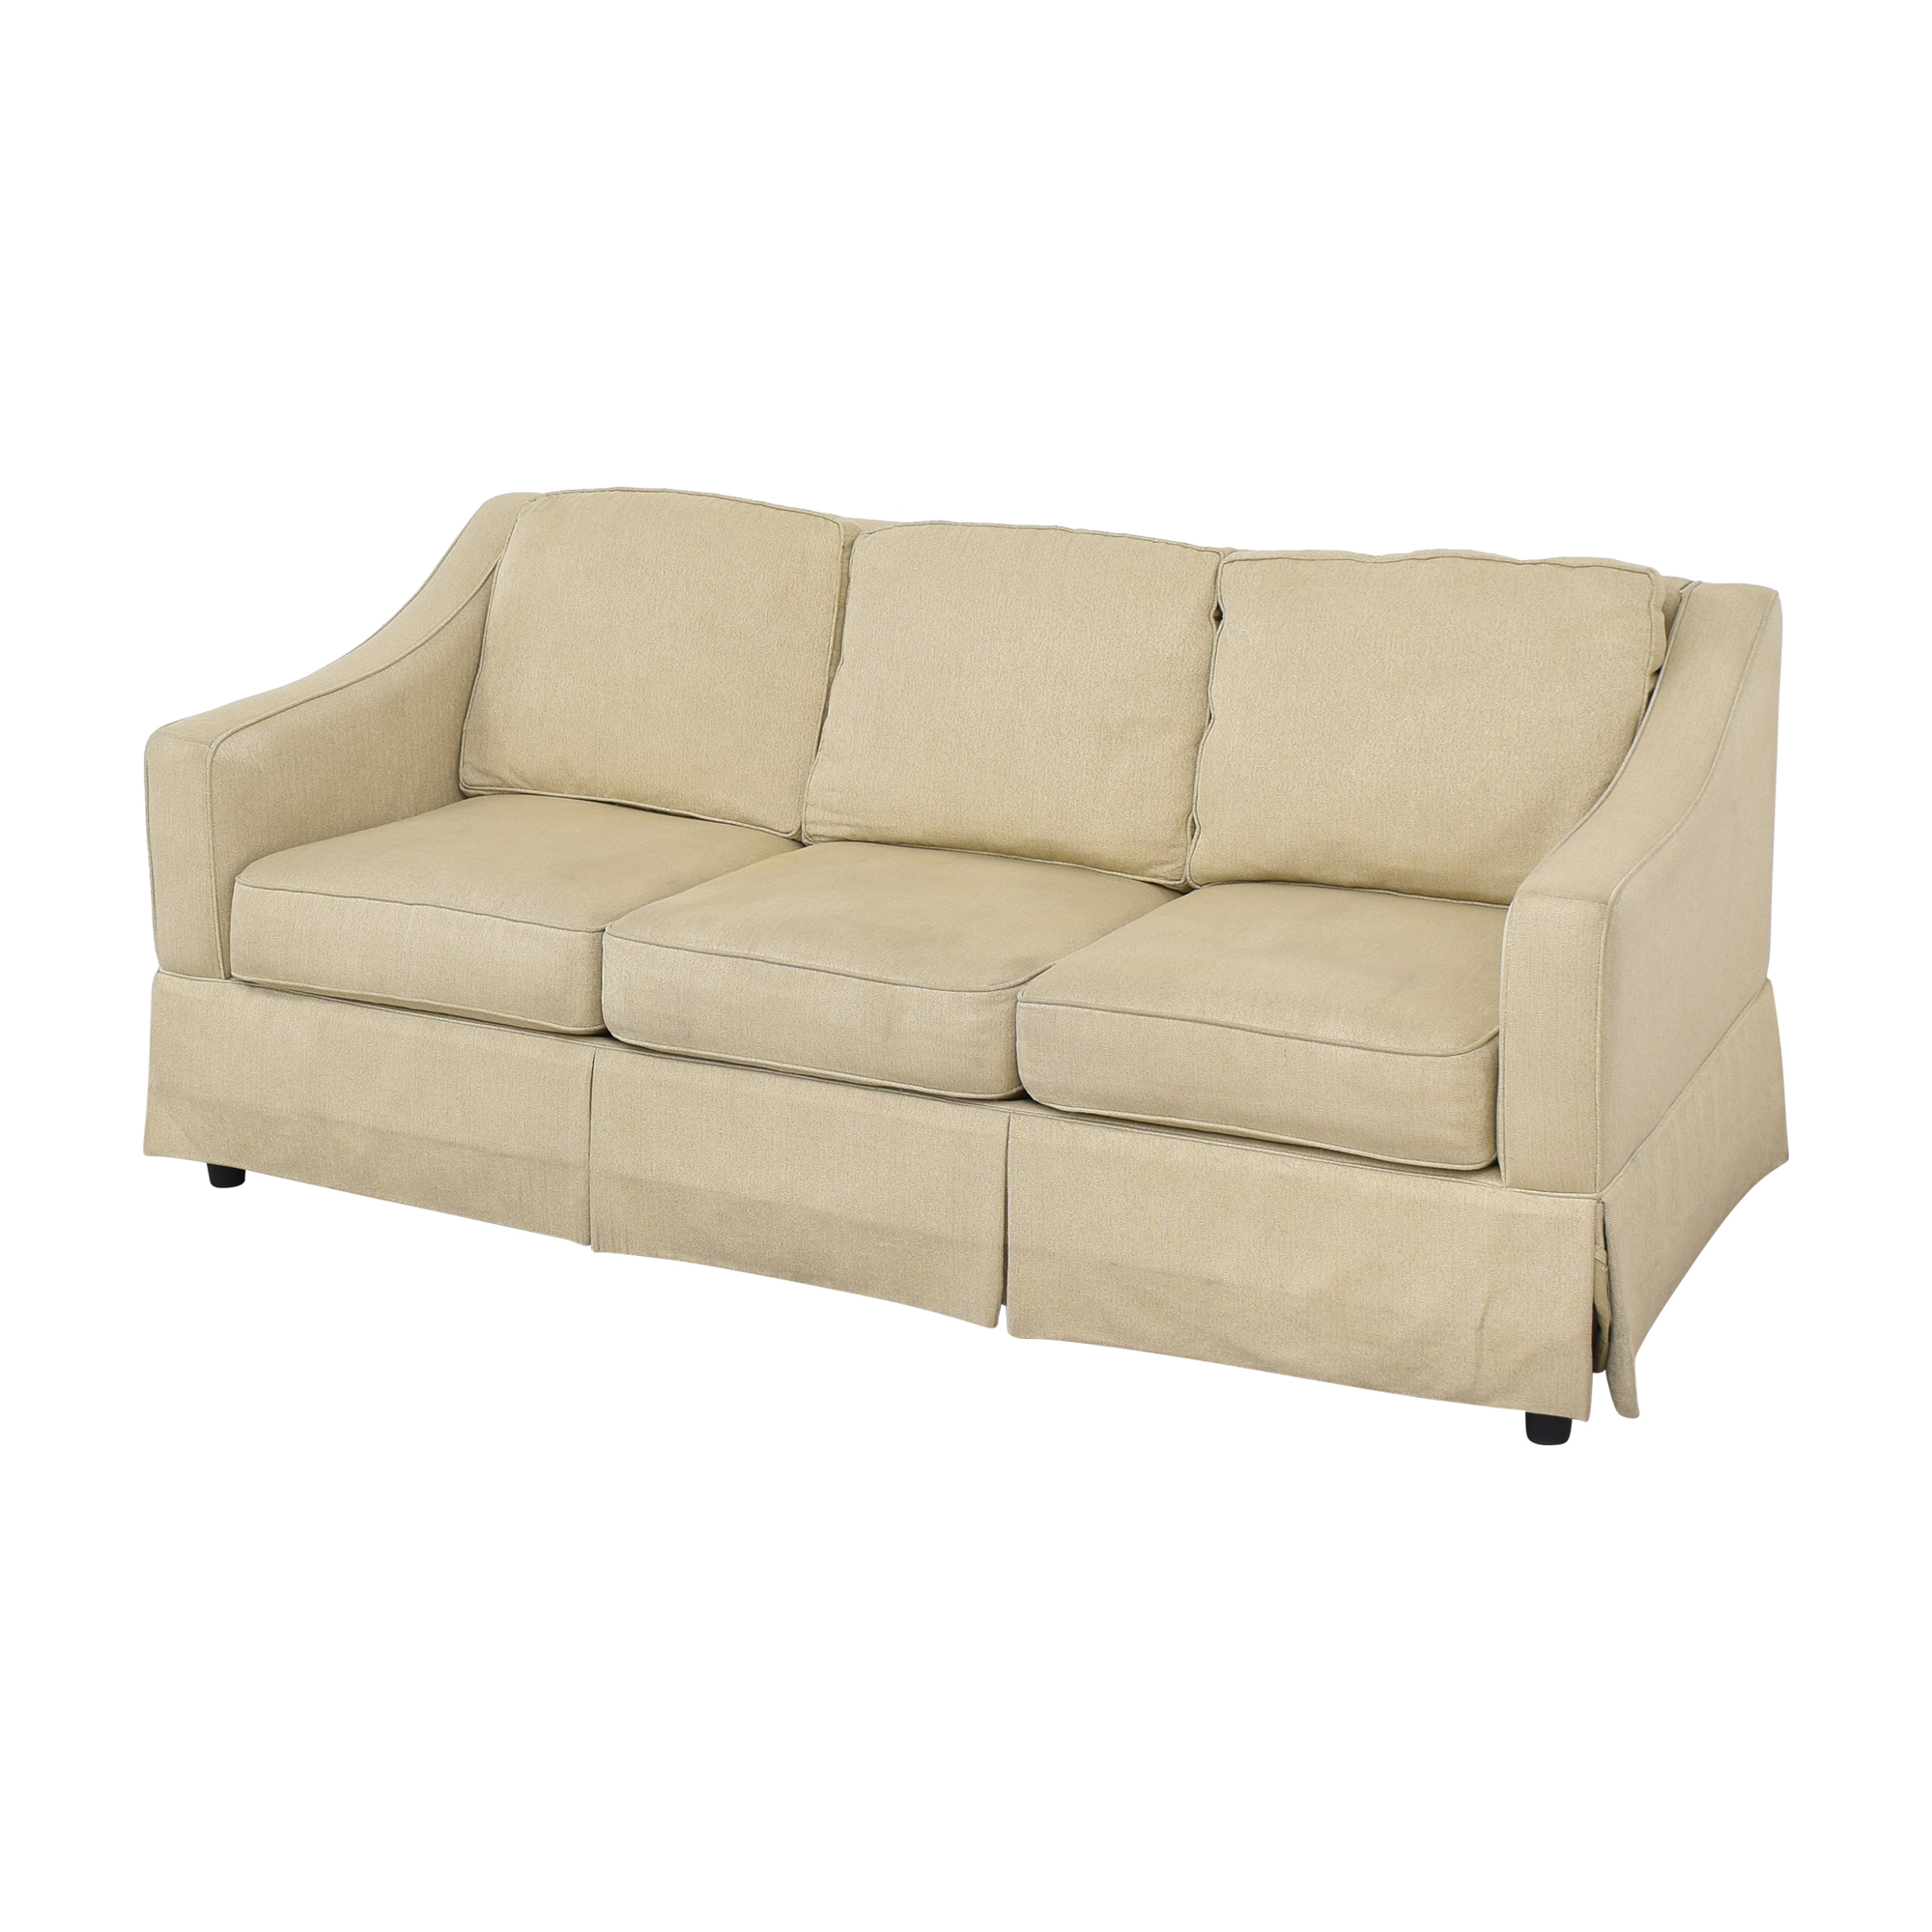 Bloomingdale's Bauhaus Sloped Arm Sofa / Classic Sofas